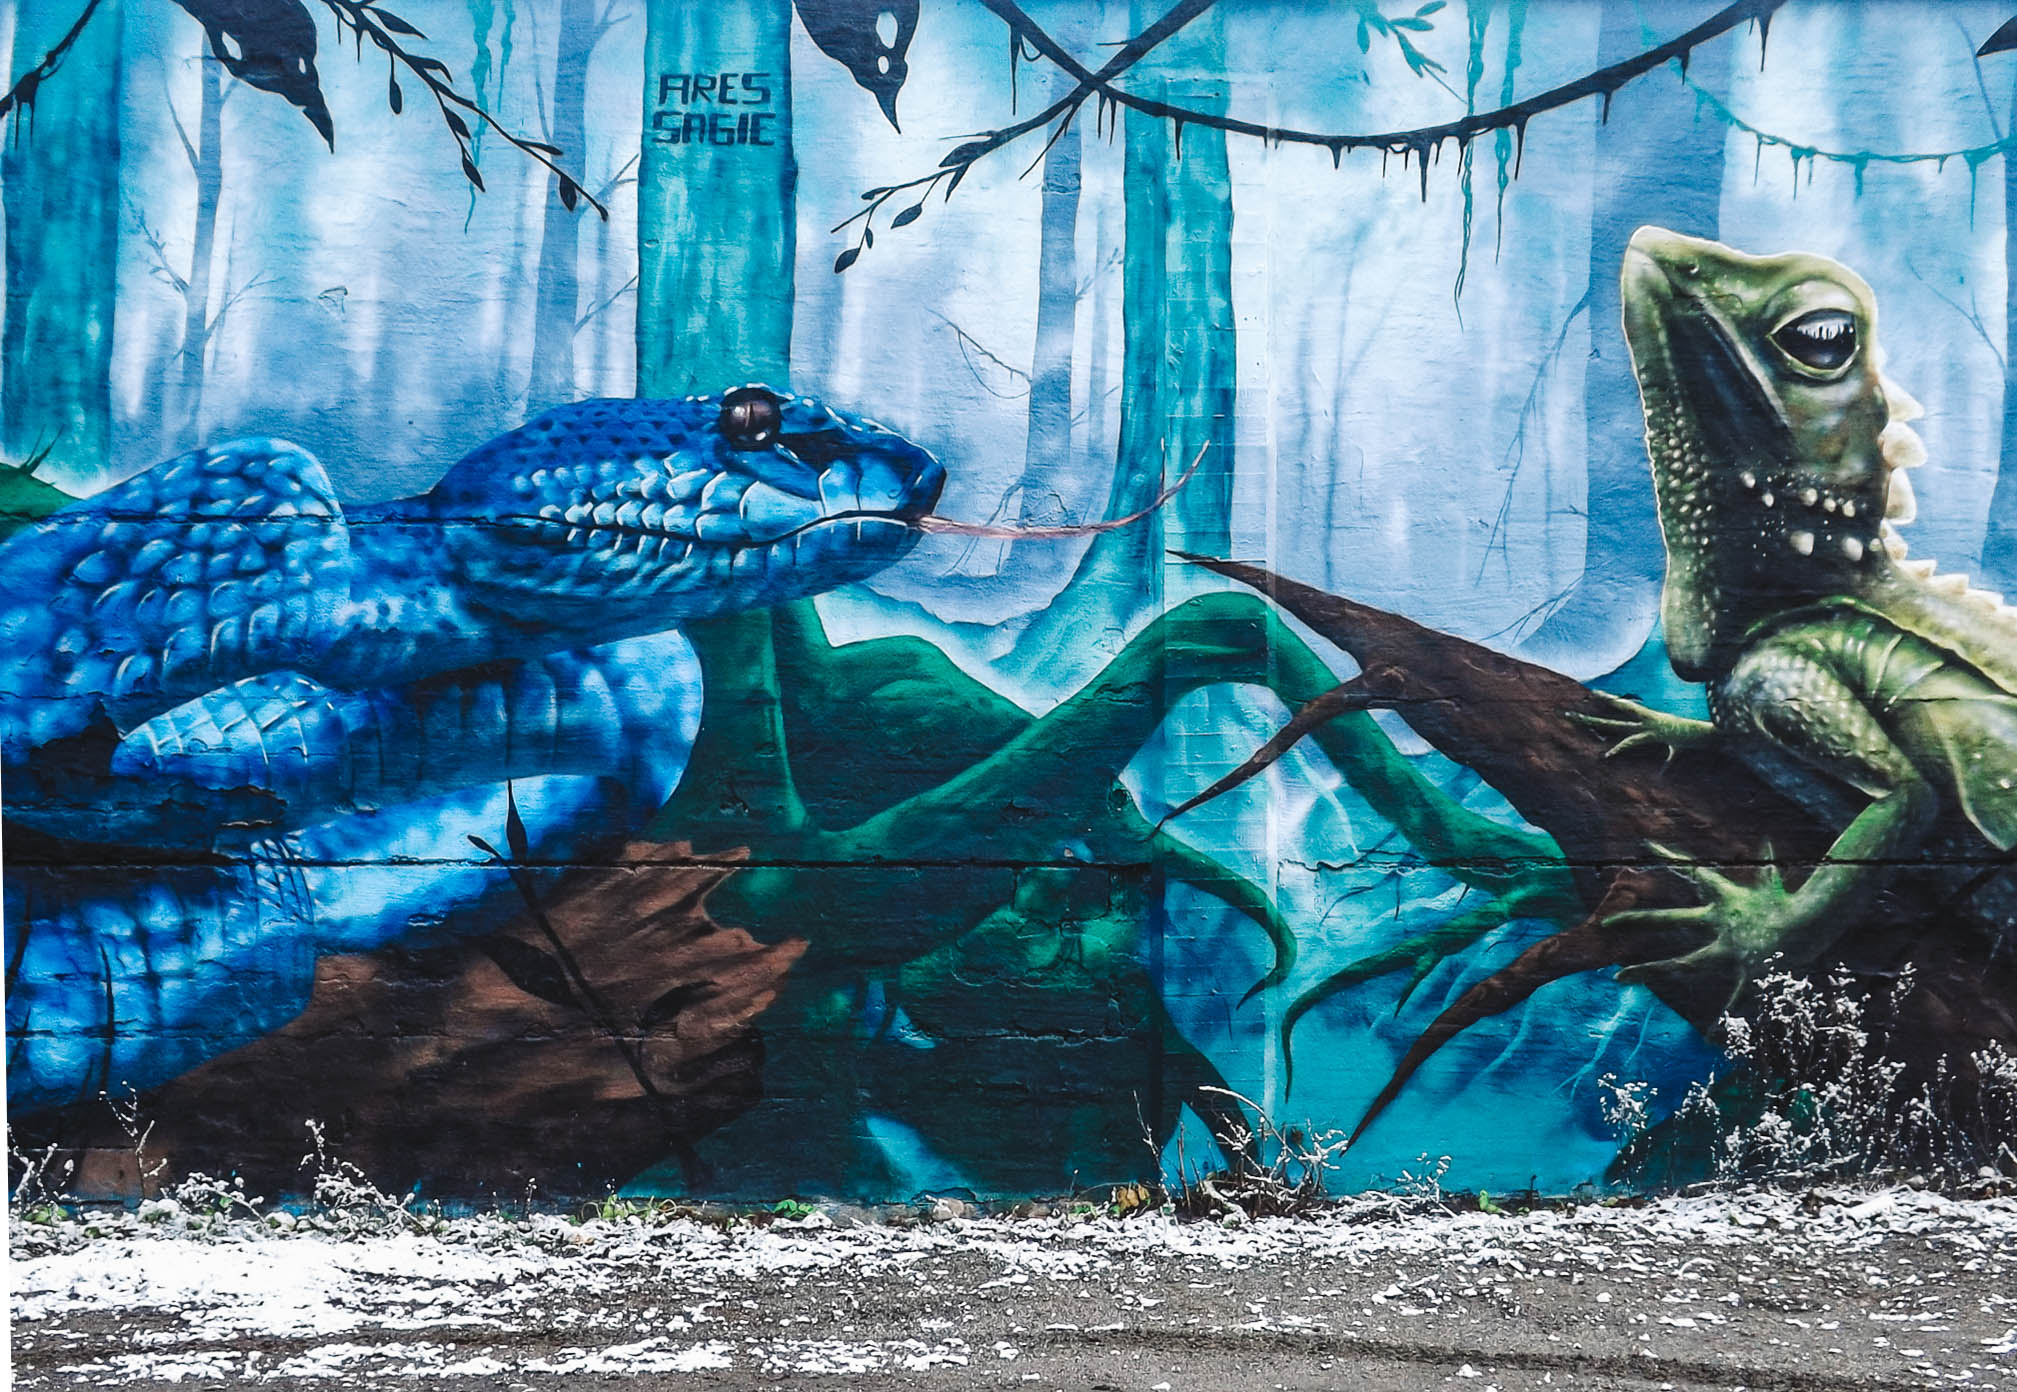 reptile mural by Fires Sagie Snosatra graffiti park Stockholm Sweden | Best Street Art Cities